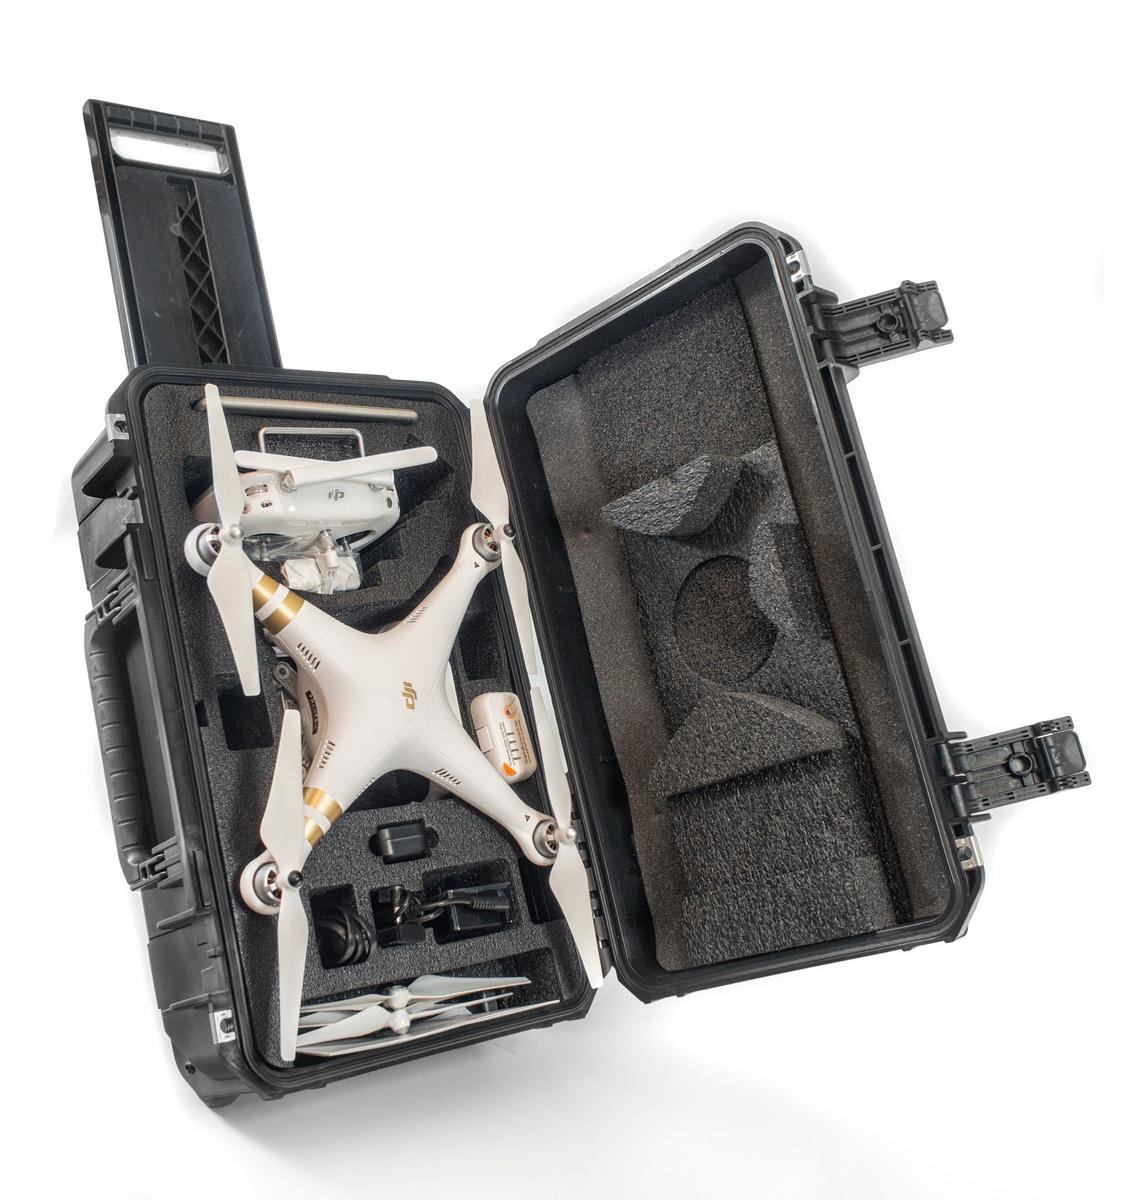 CasePro DJI Phantom 3 Carry-On Case